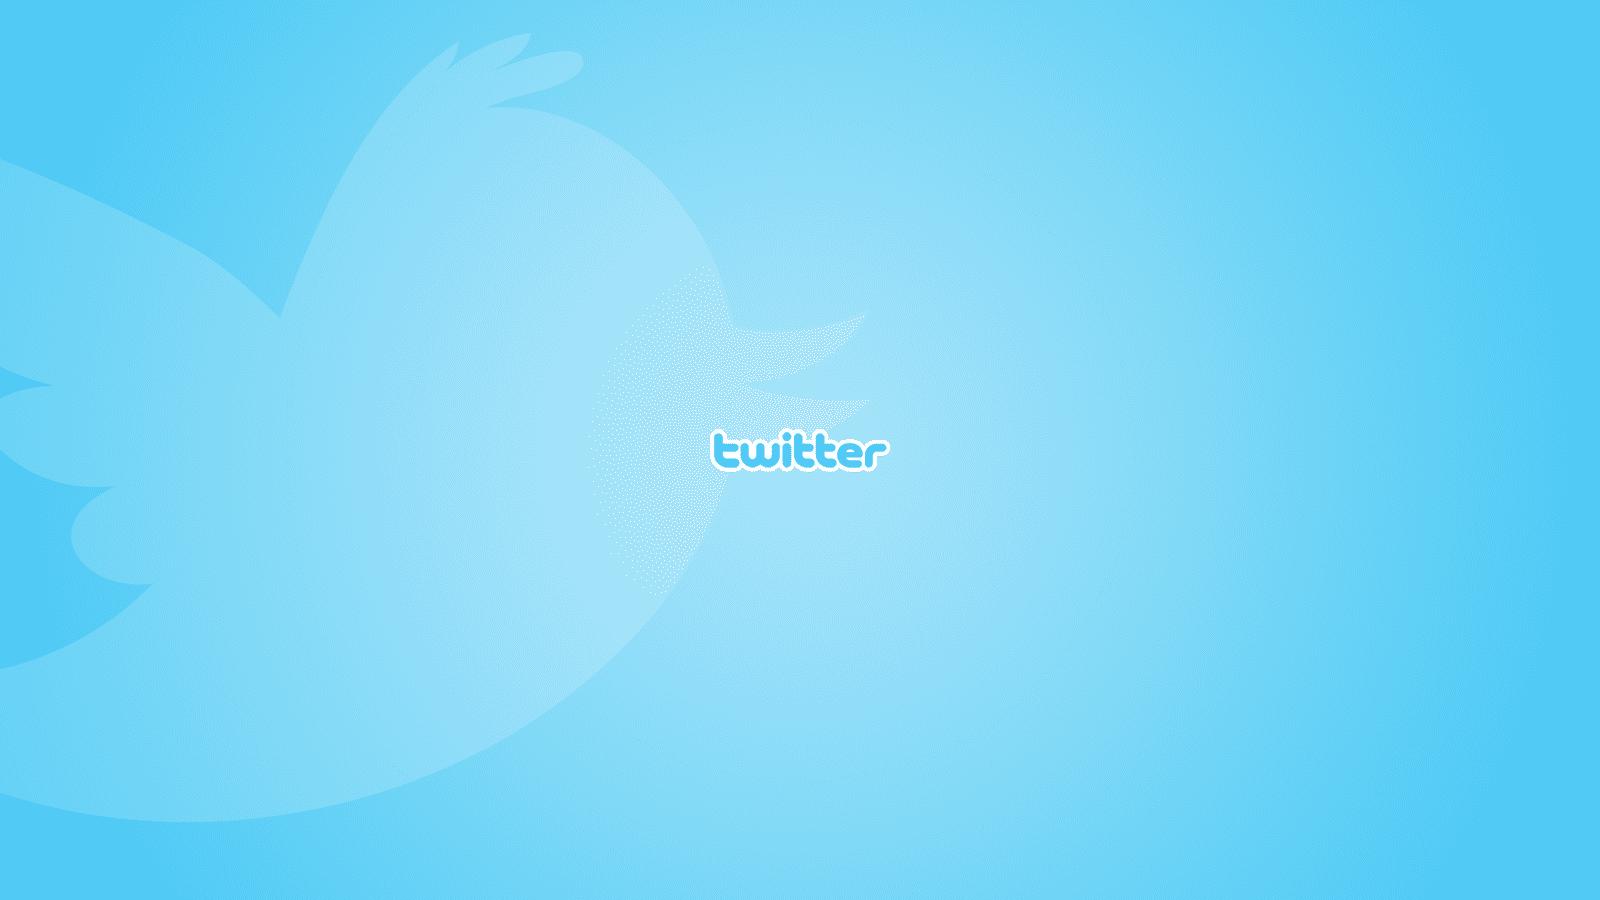 8 kont na Twitterze, które infobroker musi znać